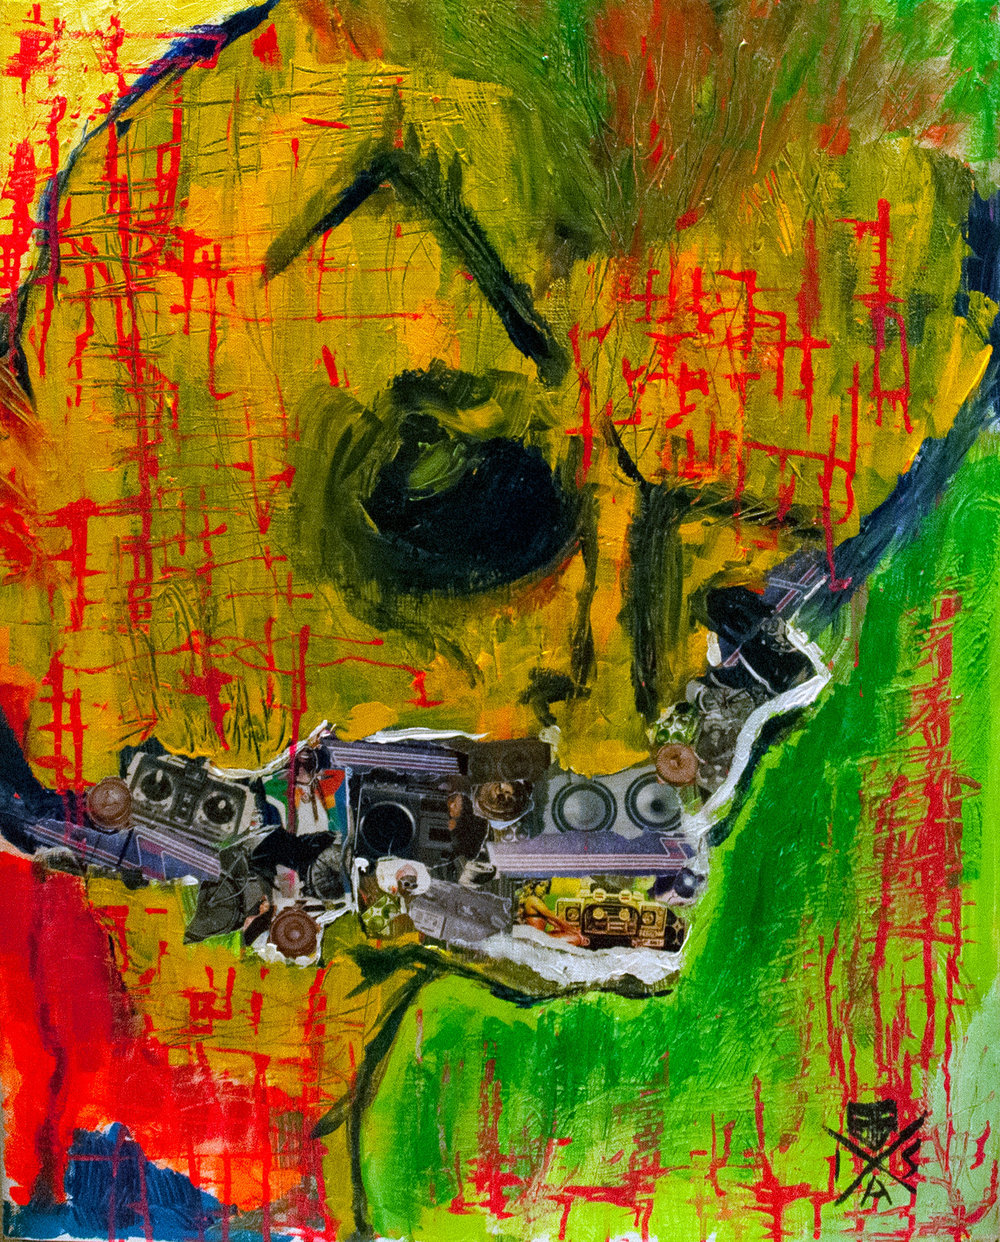 "Eze Skull. 2019. Mixed media. Acrylic and magazine collage on canvas. 24"" x 30"". $250"